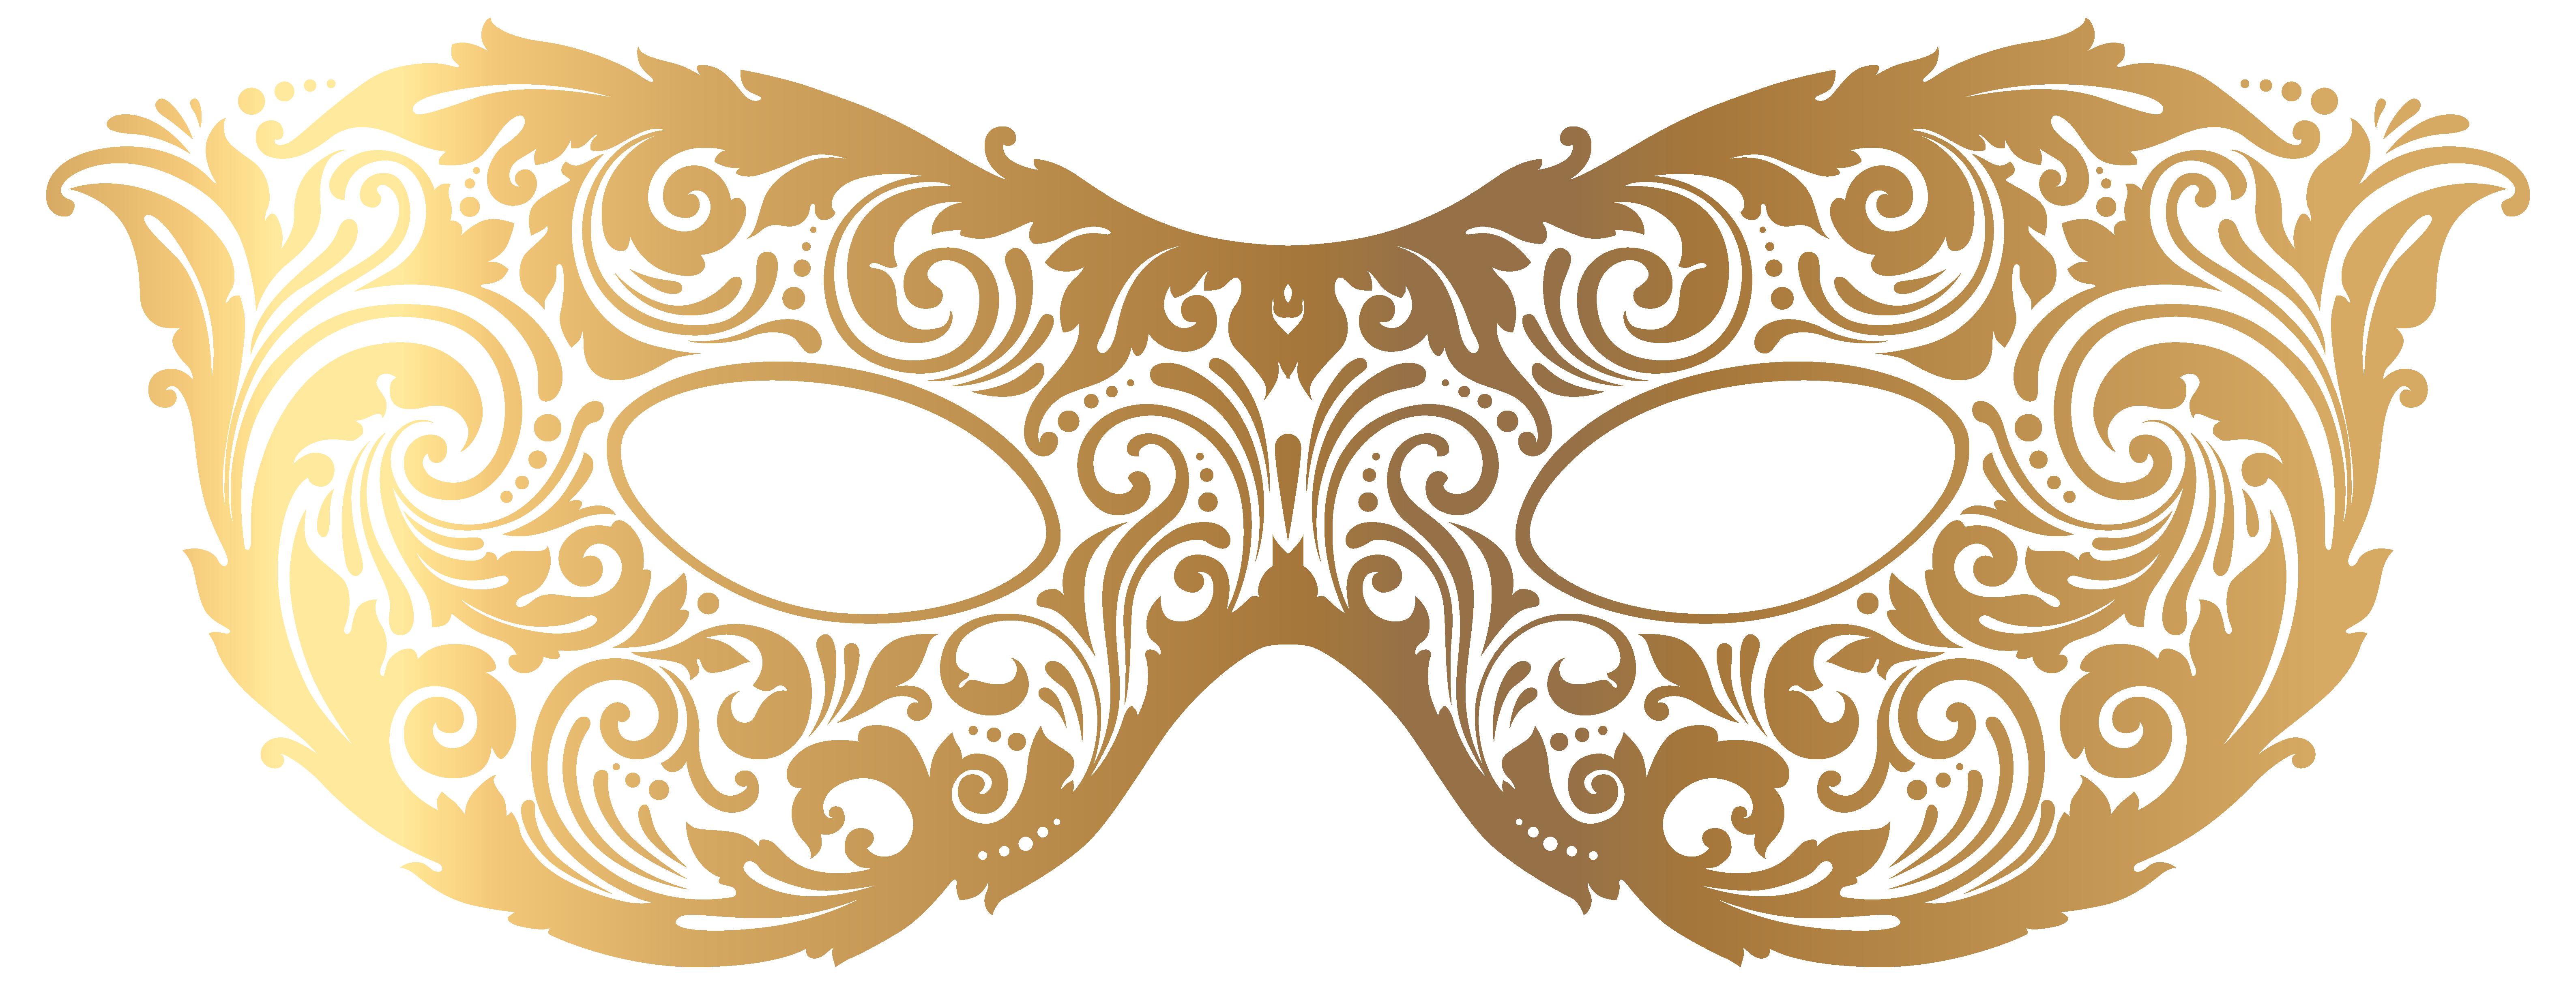 Carneval clipart carnival mask Mask and Image clipart FreePNGImg